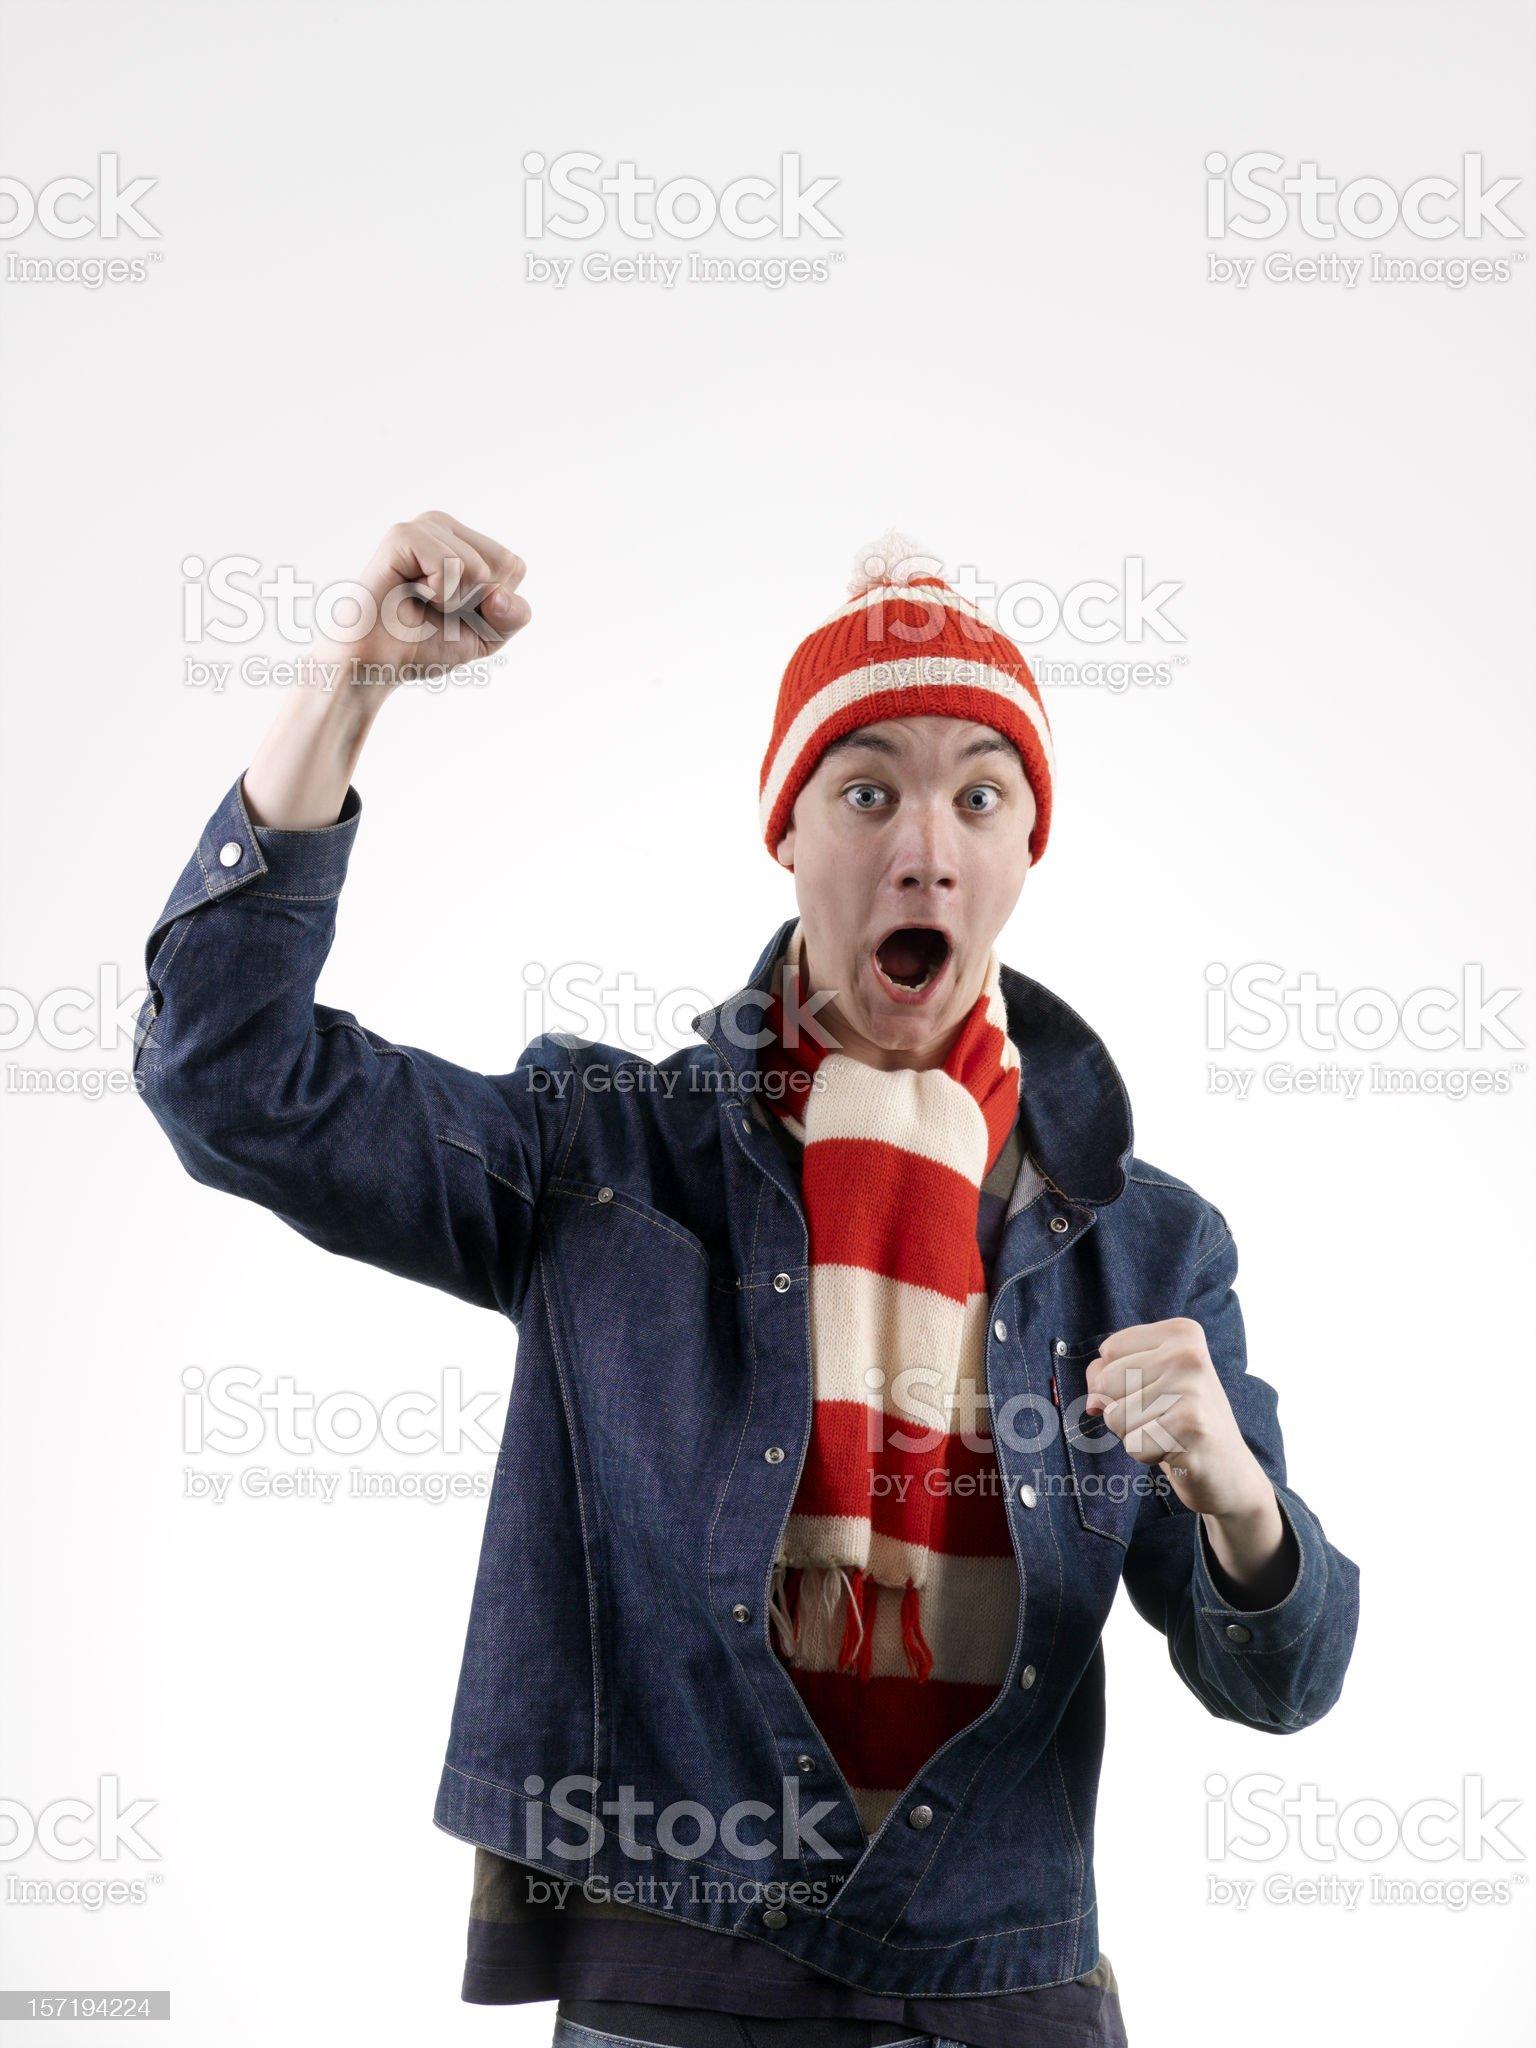 Football fan shouting royalty-free stock photo